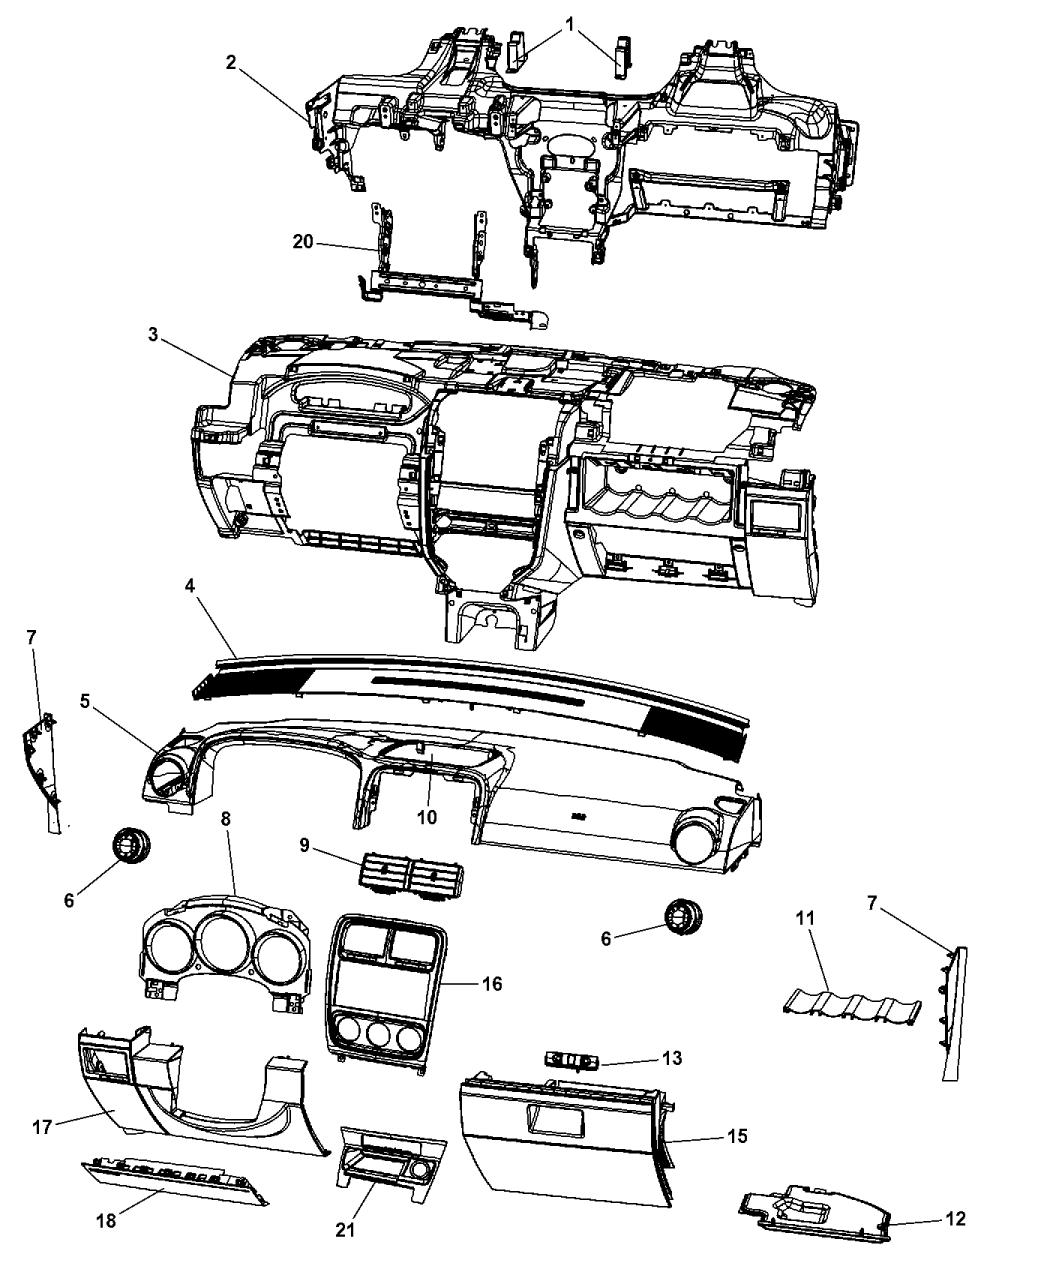 2012 dodge caliber engine diagram